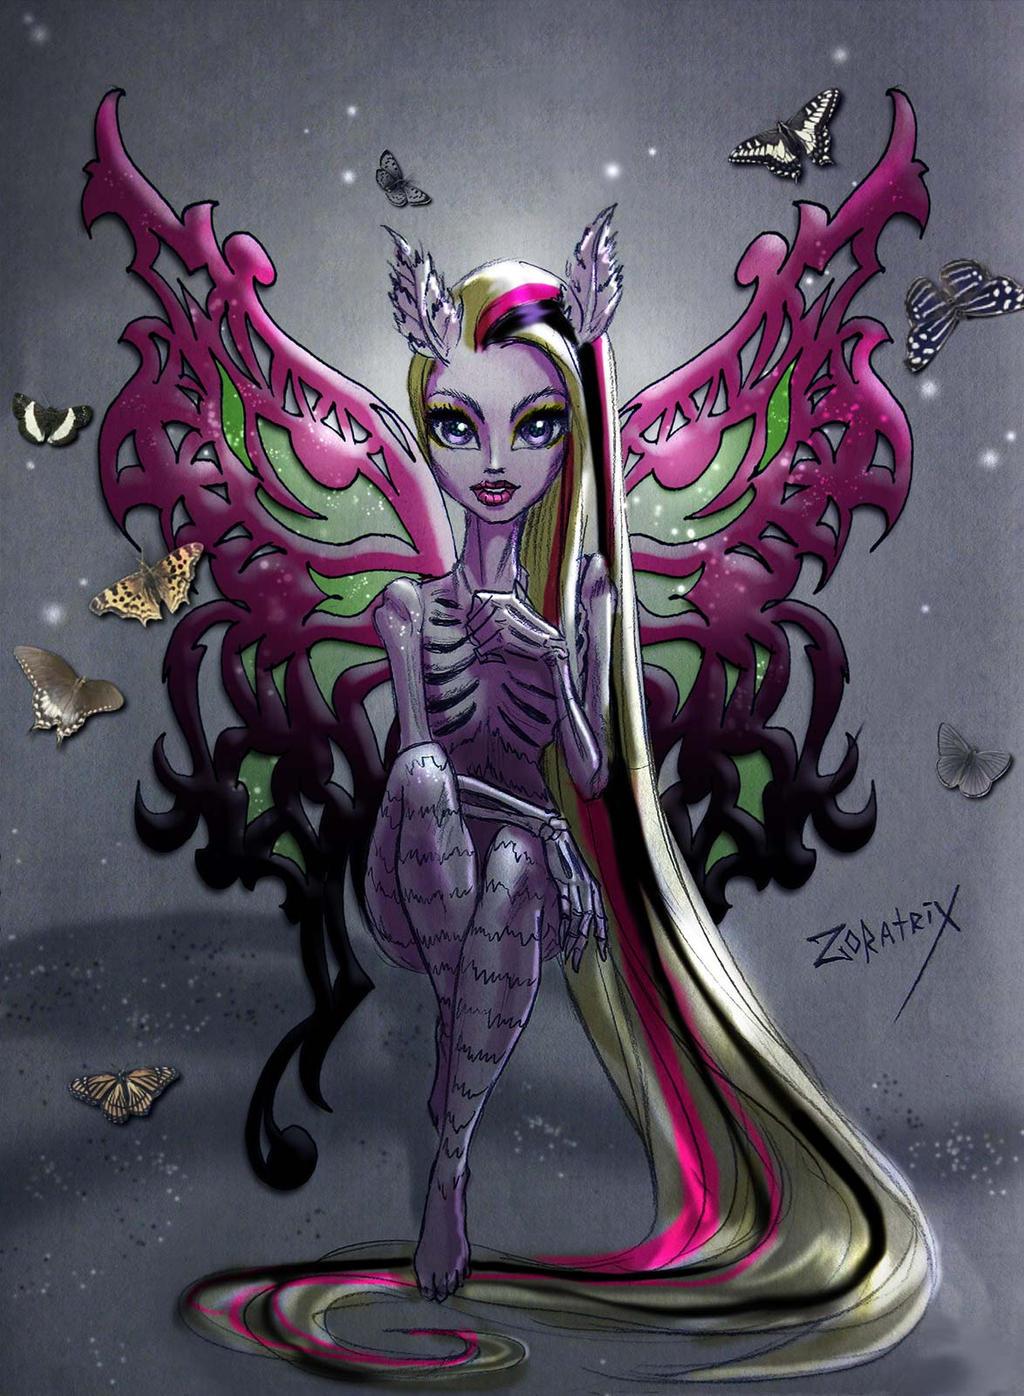 Bonita by zoratrix on deviantart - Monster high bonita ...